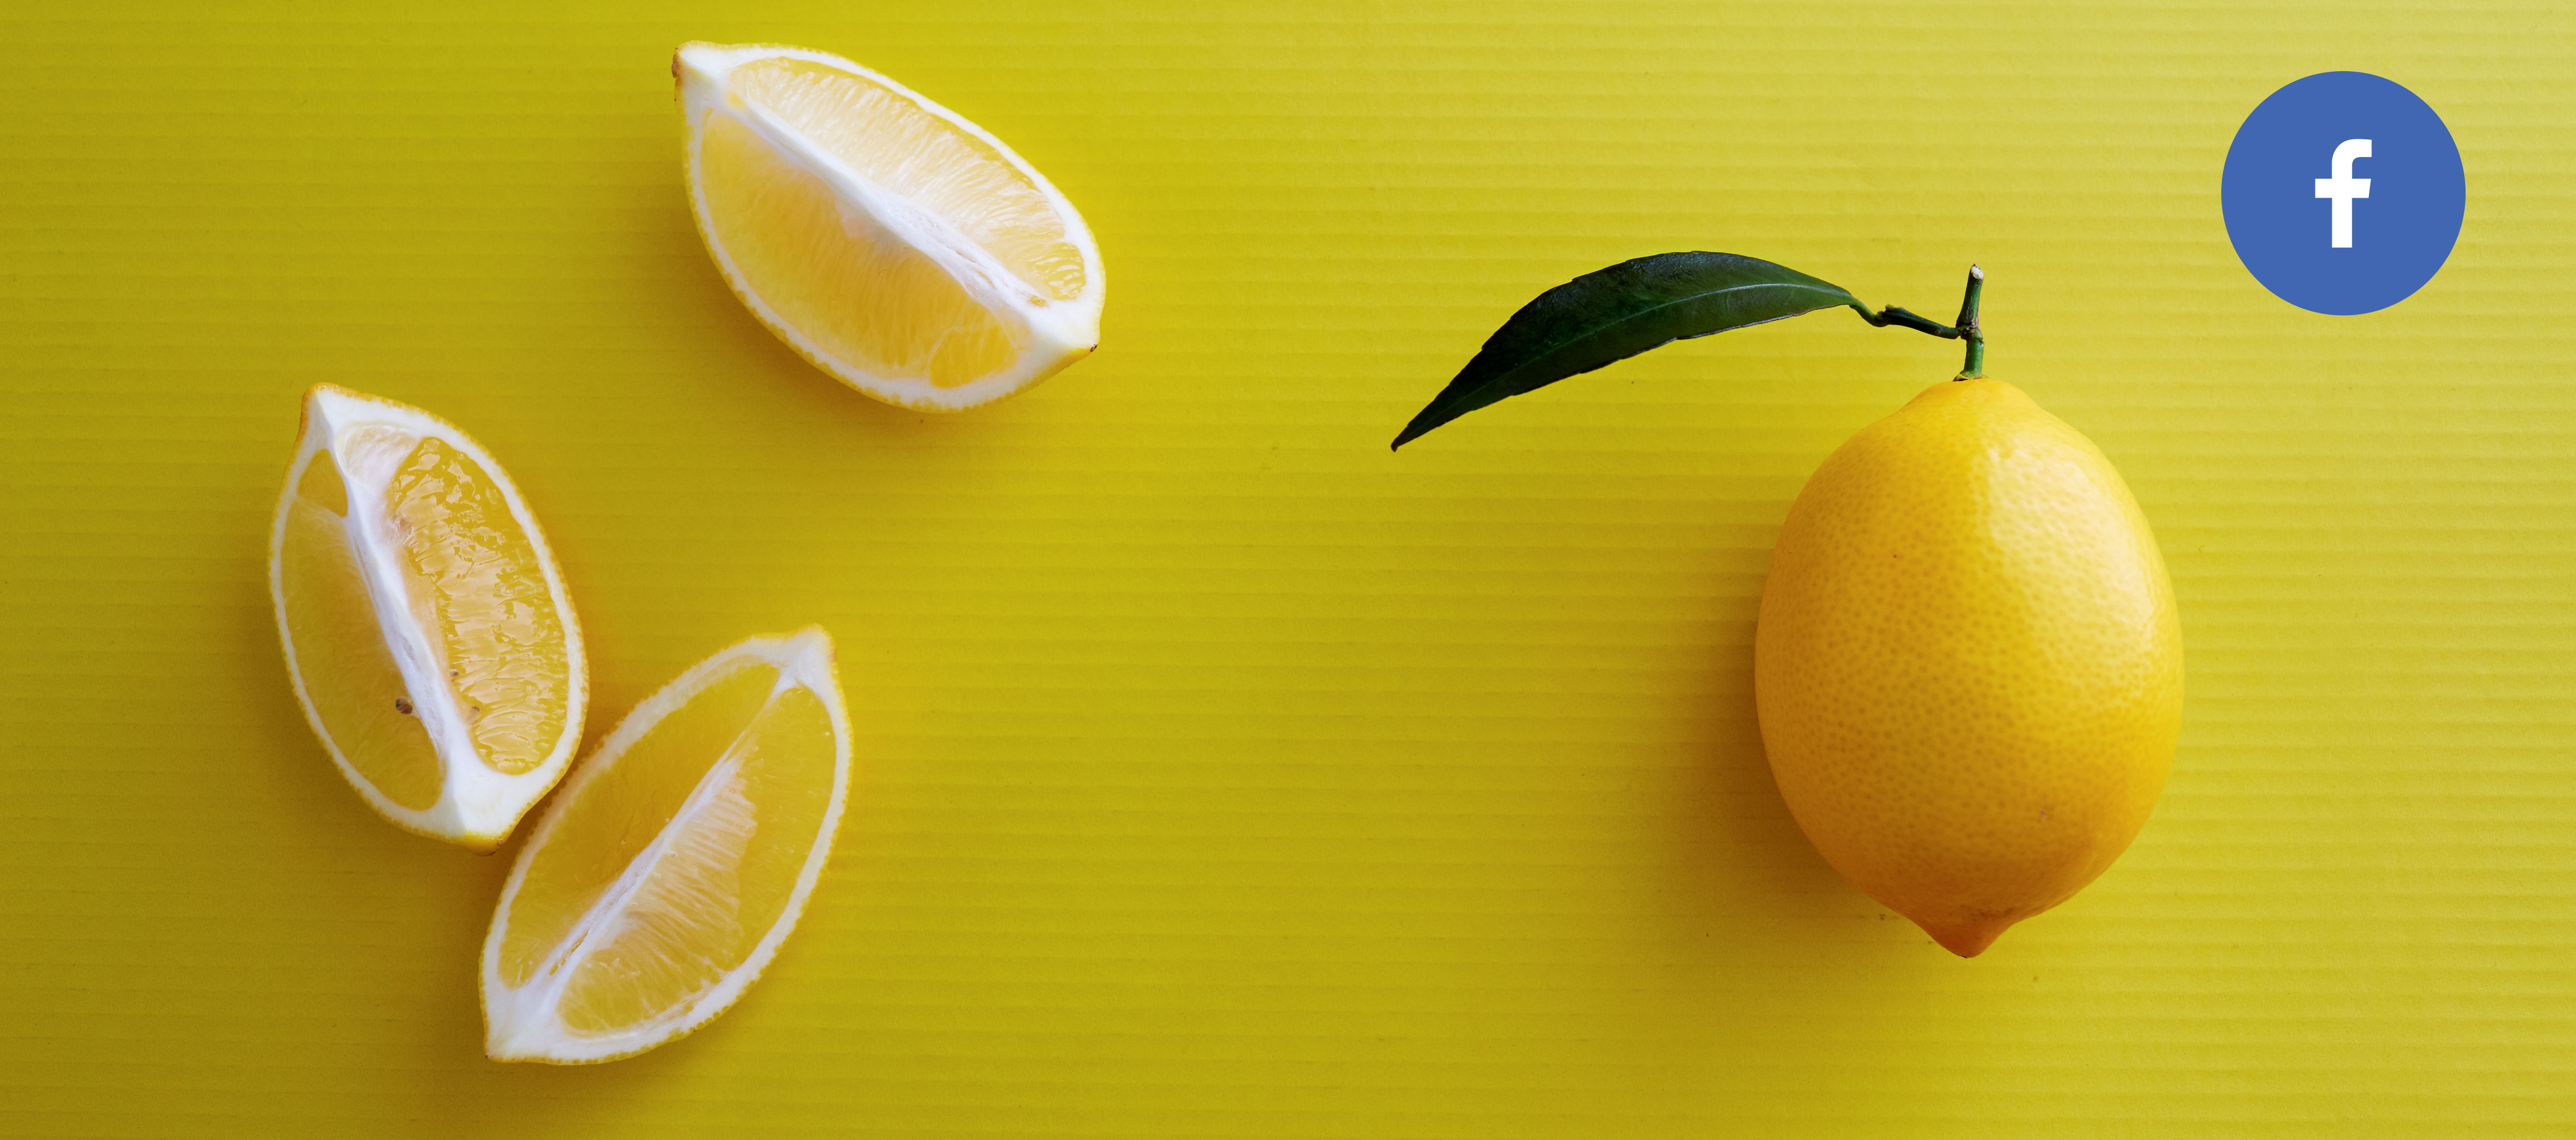 When Facebook hands you lemons, make email-ade